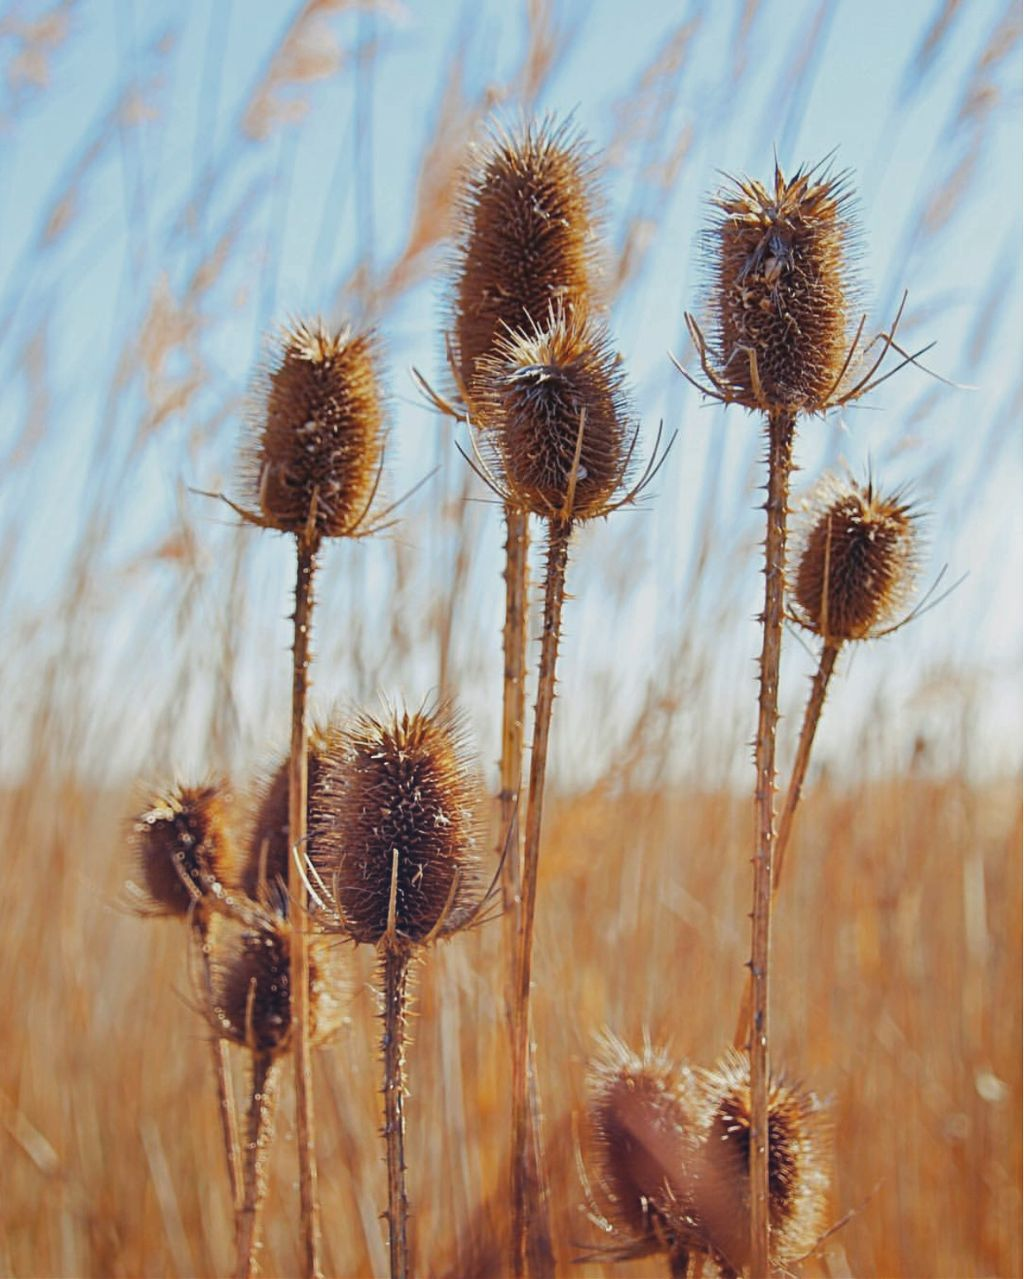 #nature #wildplants #thistles #grass #bluredbackground #depthoffield #horizon #sunnylight #bluesky #naturephotography                                                                   #freetoedit